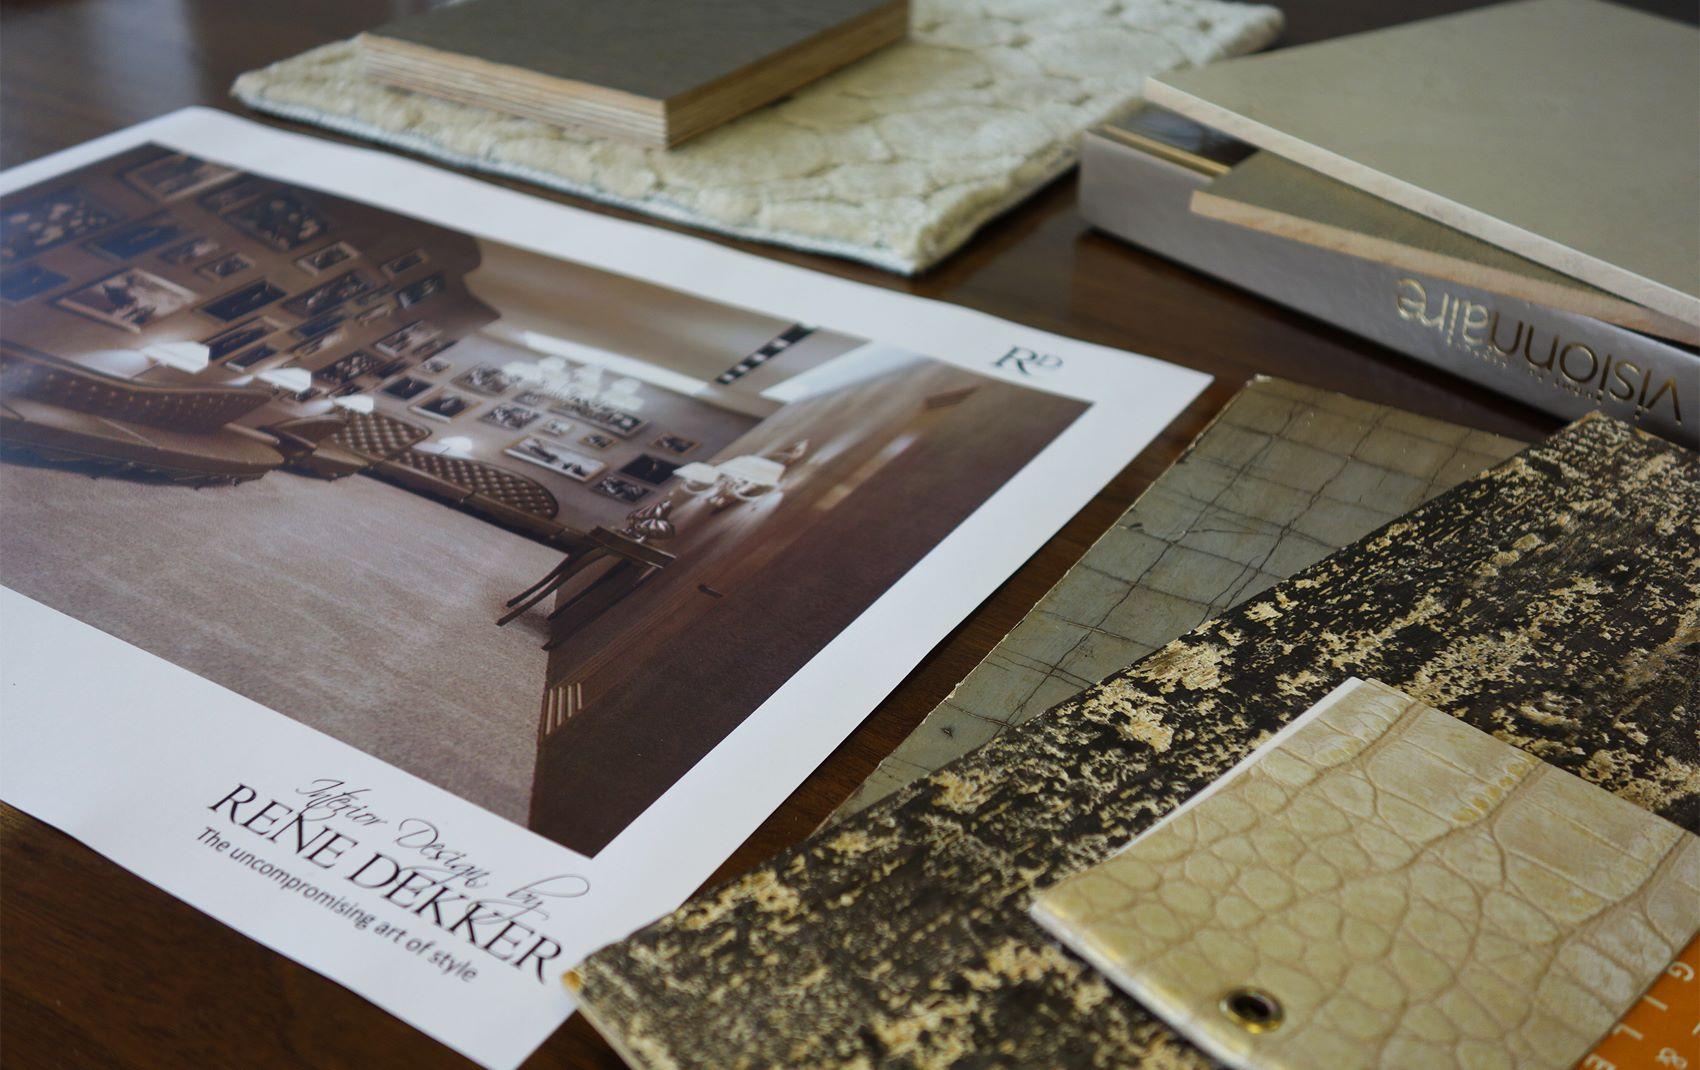 moscow villa - Luxury Designer Rene Dekker Showcases Interior Design